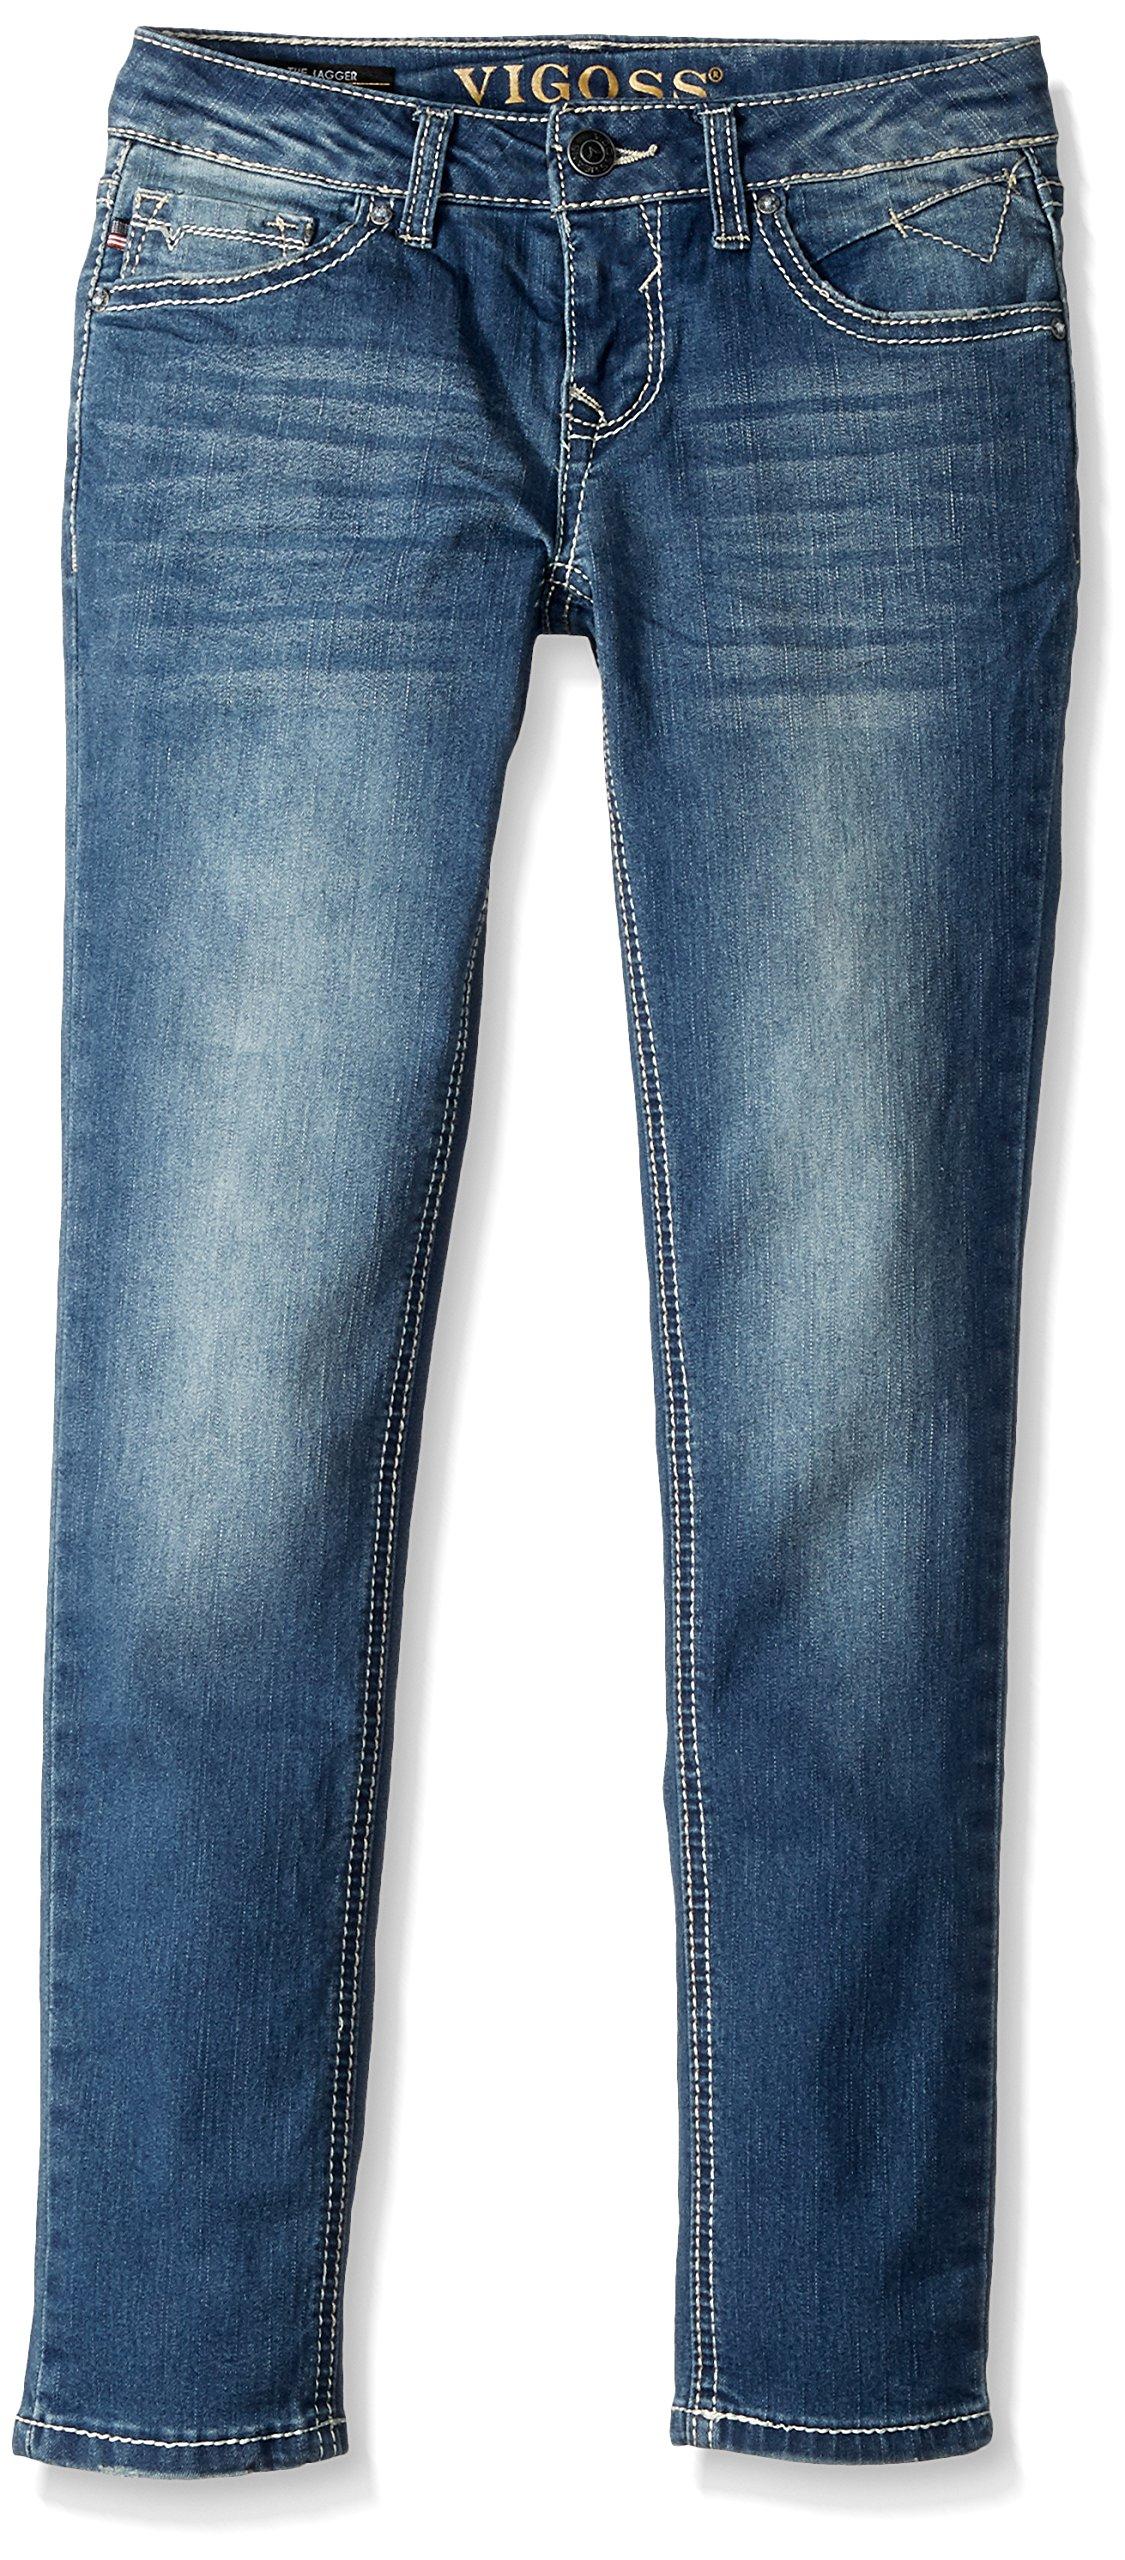 VIGOSS Girls' Big Back Pocket Jean, Vespa-445, 14